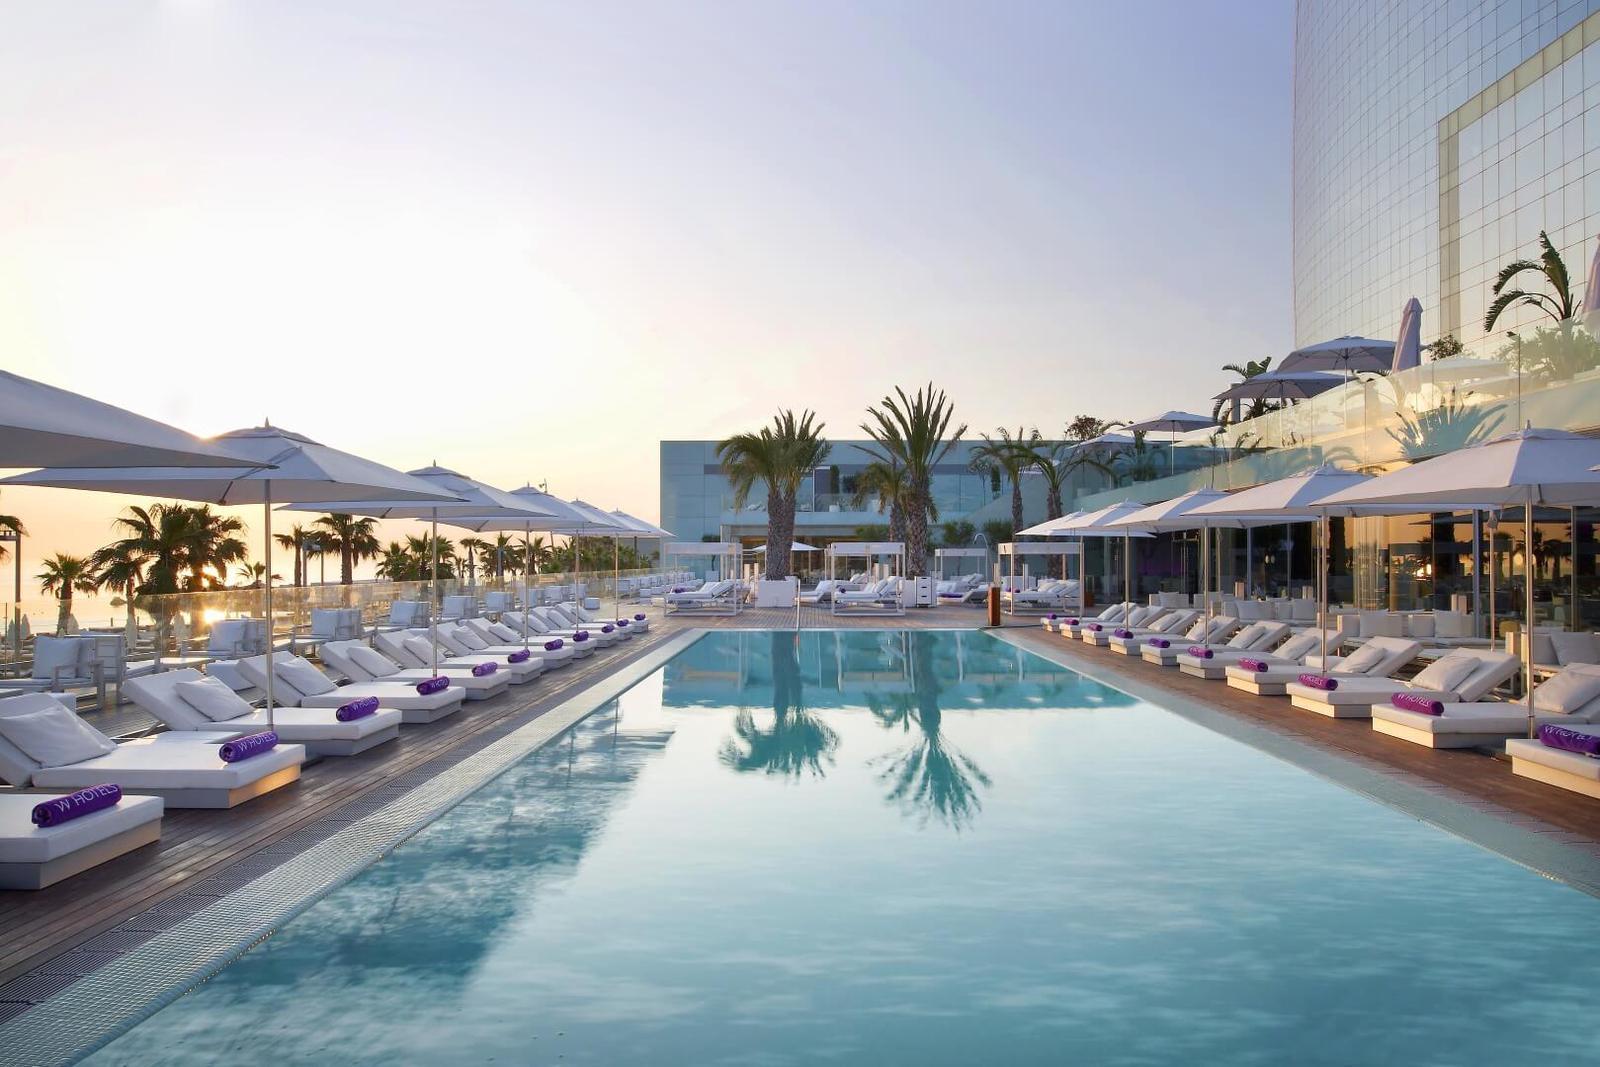 Piscina W Barcelona - Hotel de moda